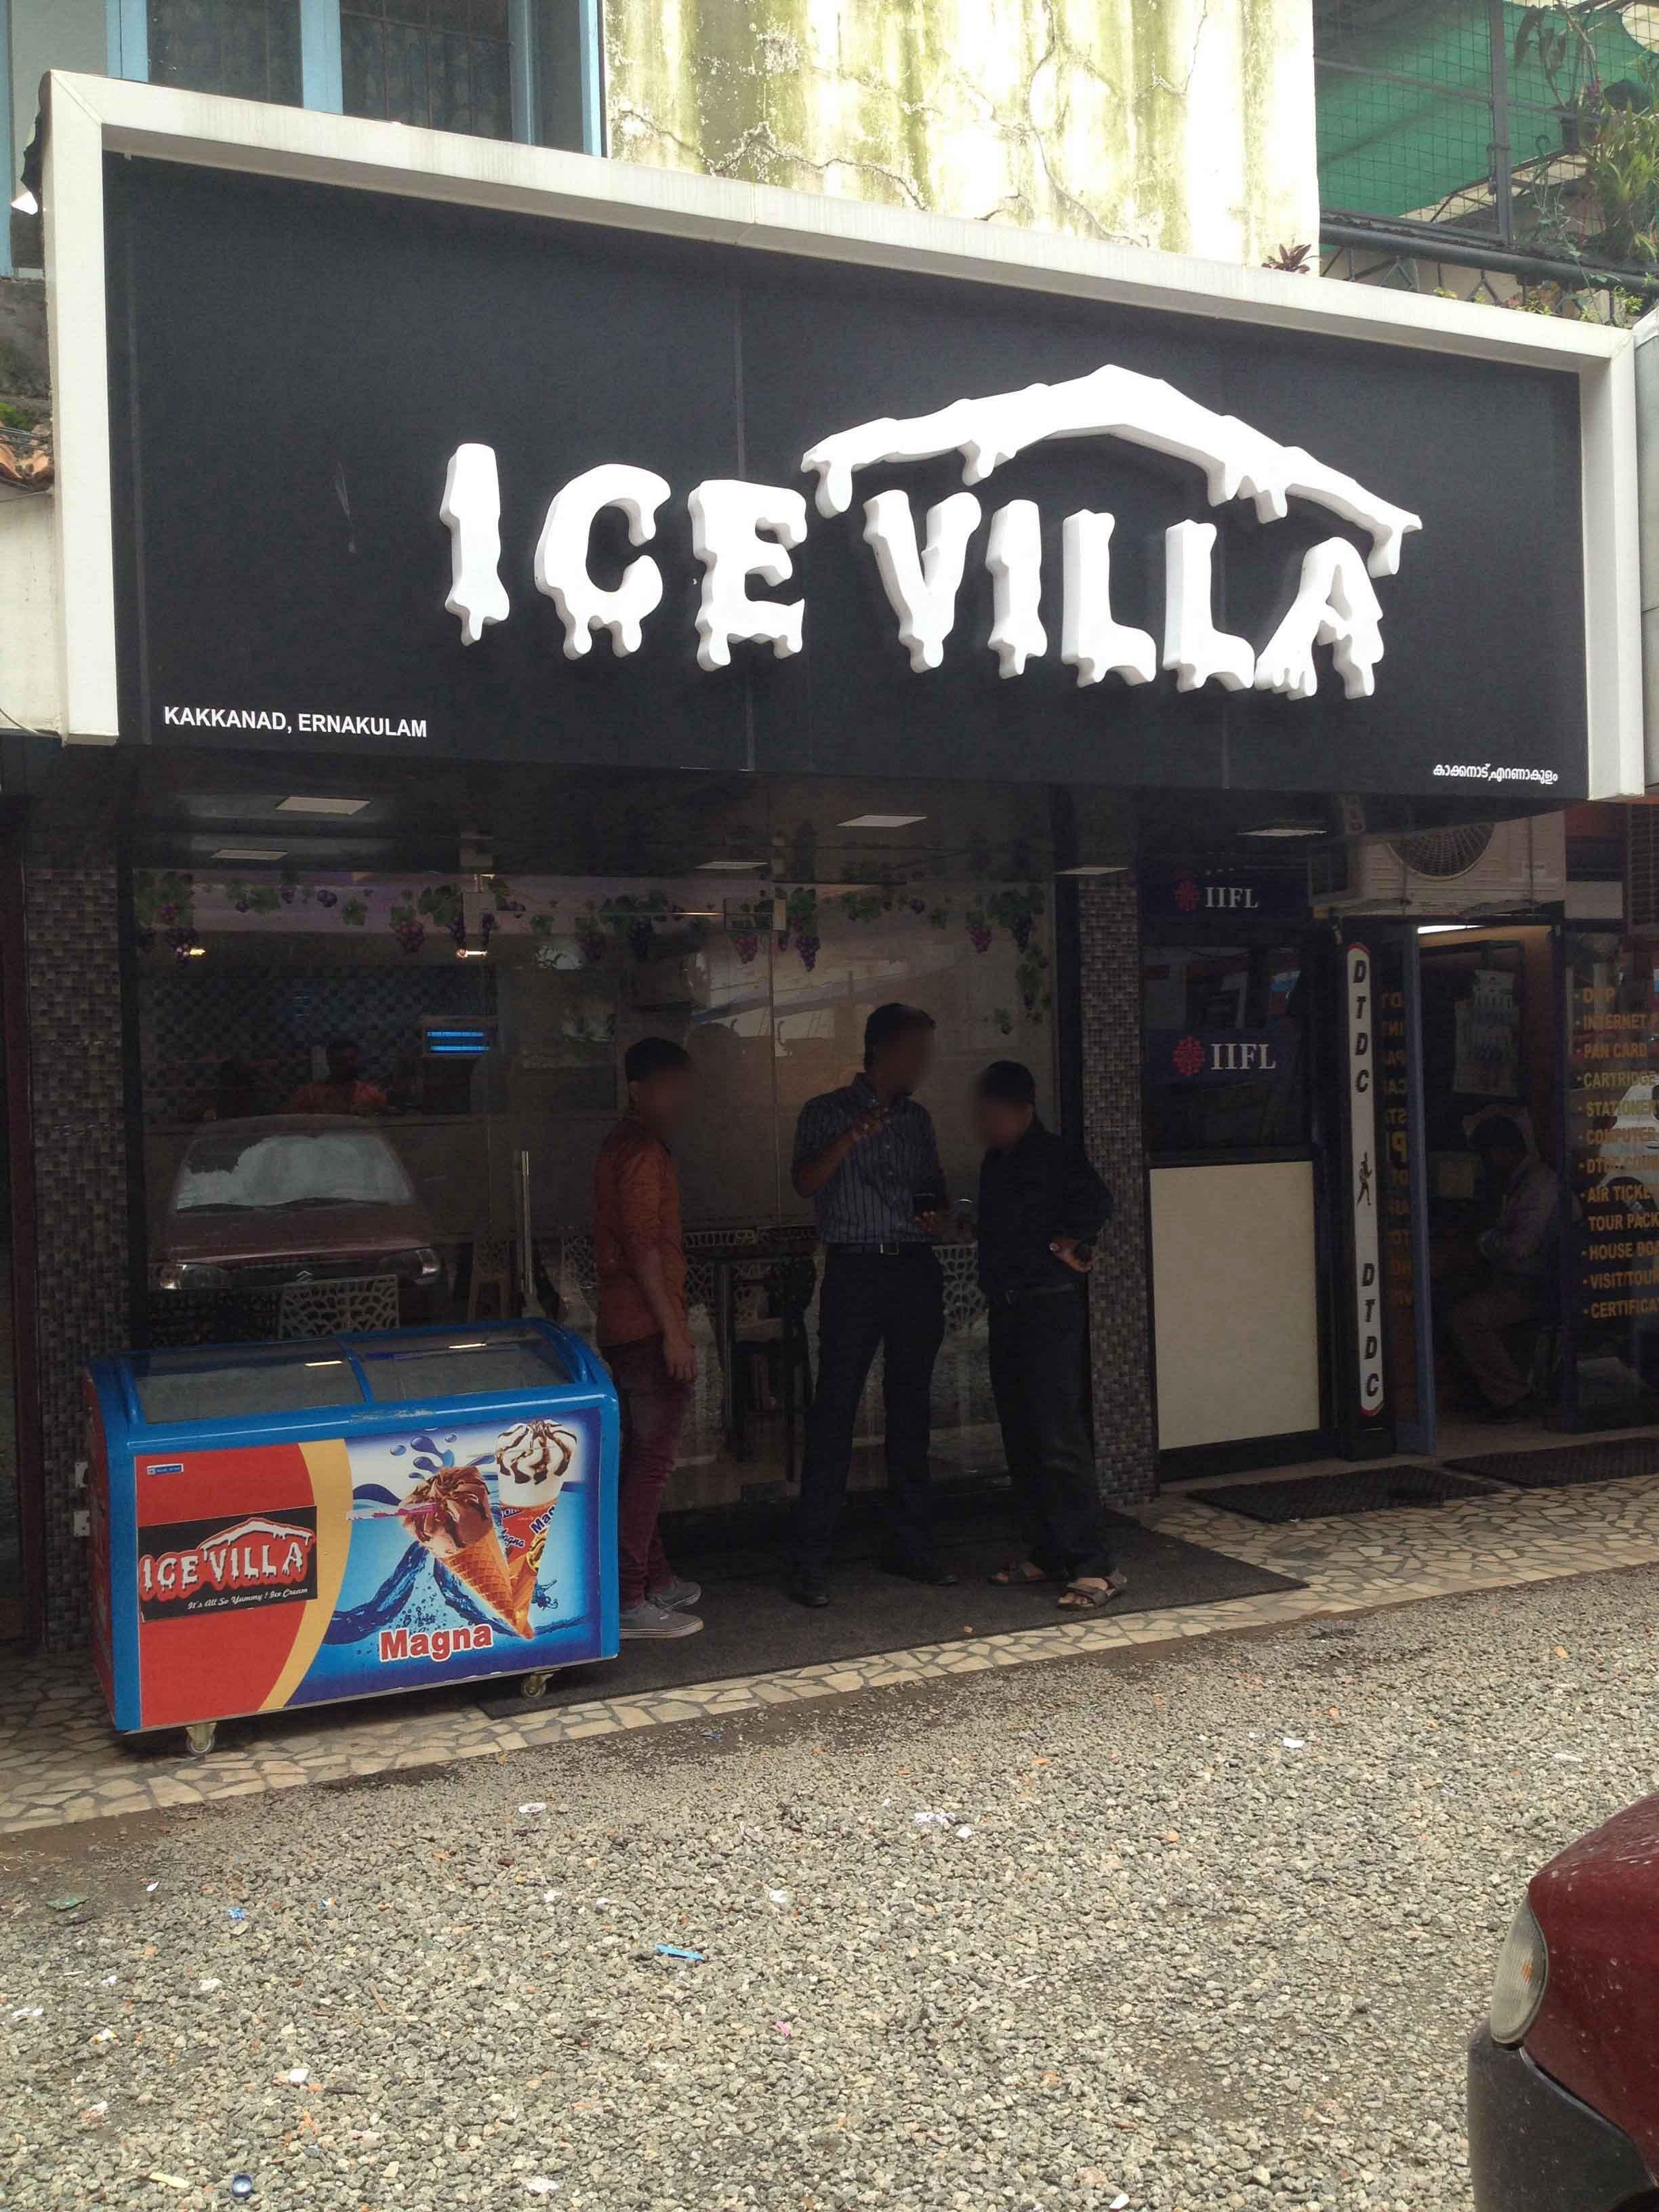 ICE VILLA - Vazhakkala - Kochi Image